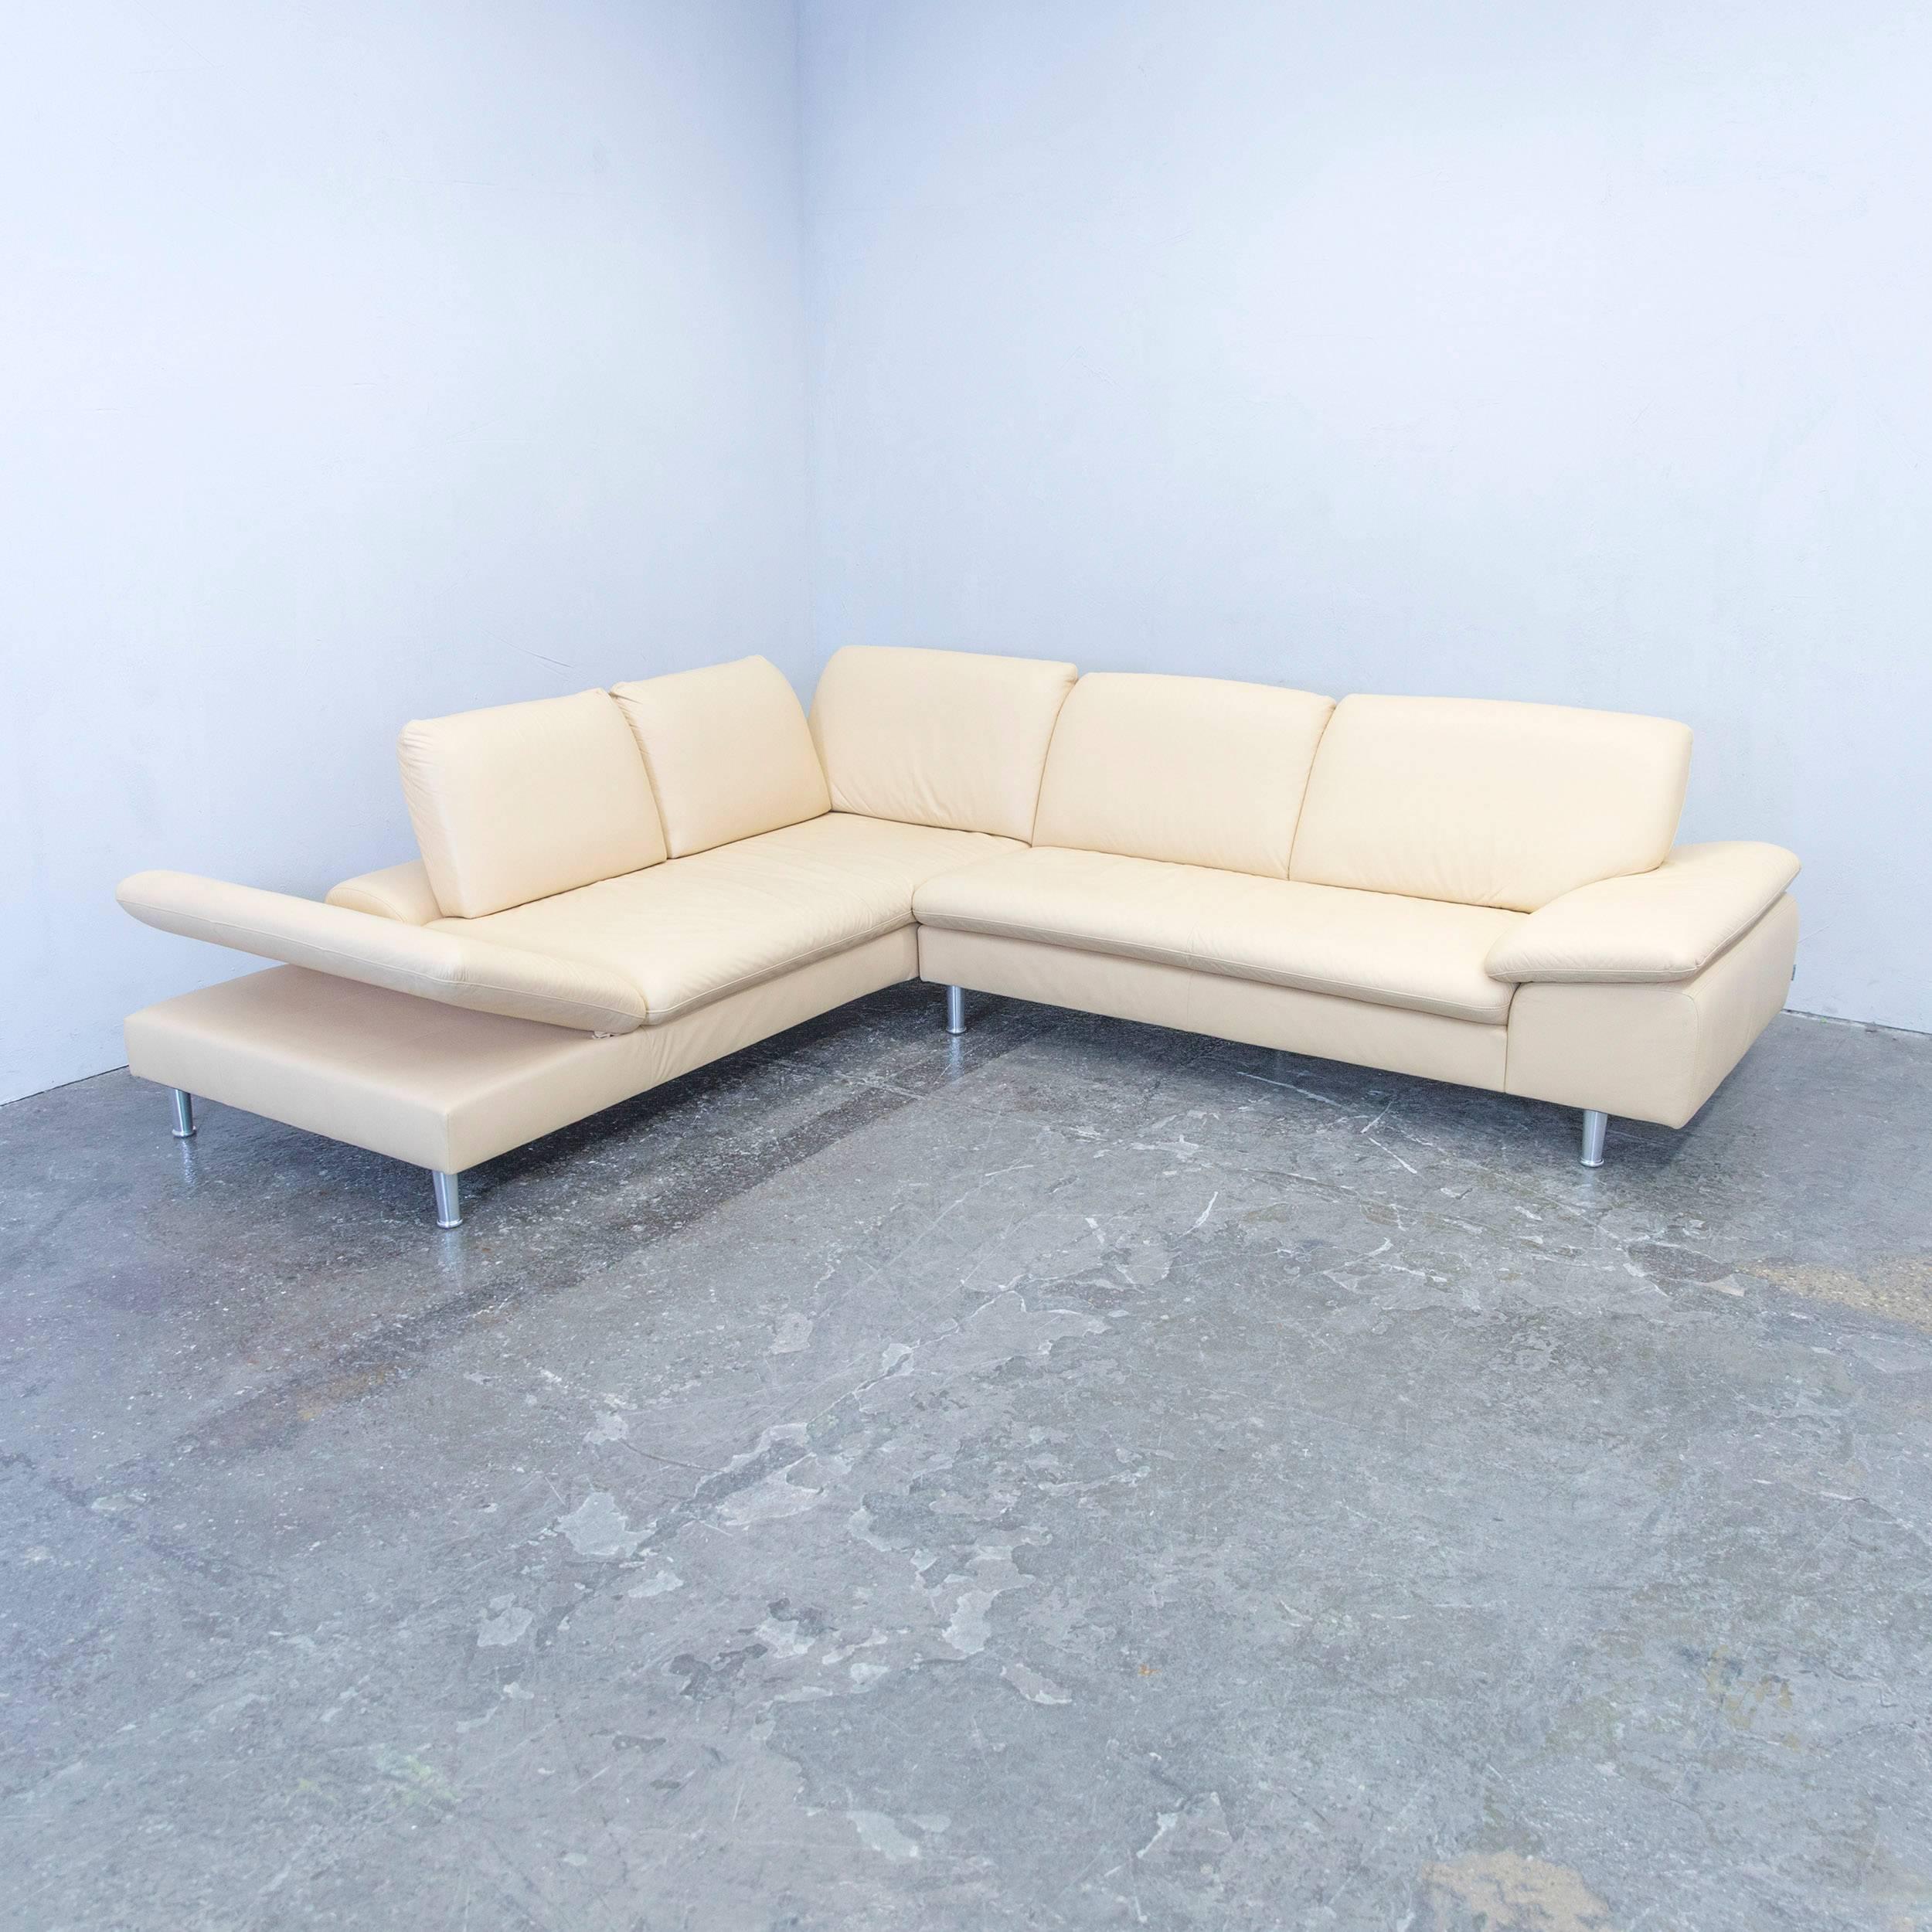 Kautsch Kaufen Fabulous Fabulous Kautsch Sofa Kautsch Sofa